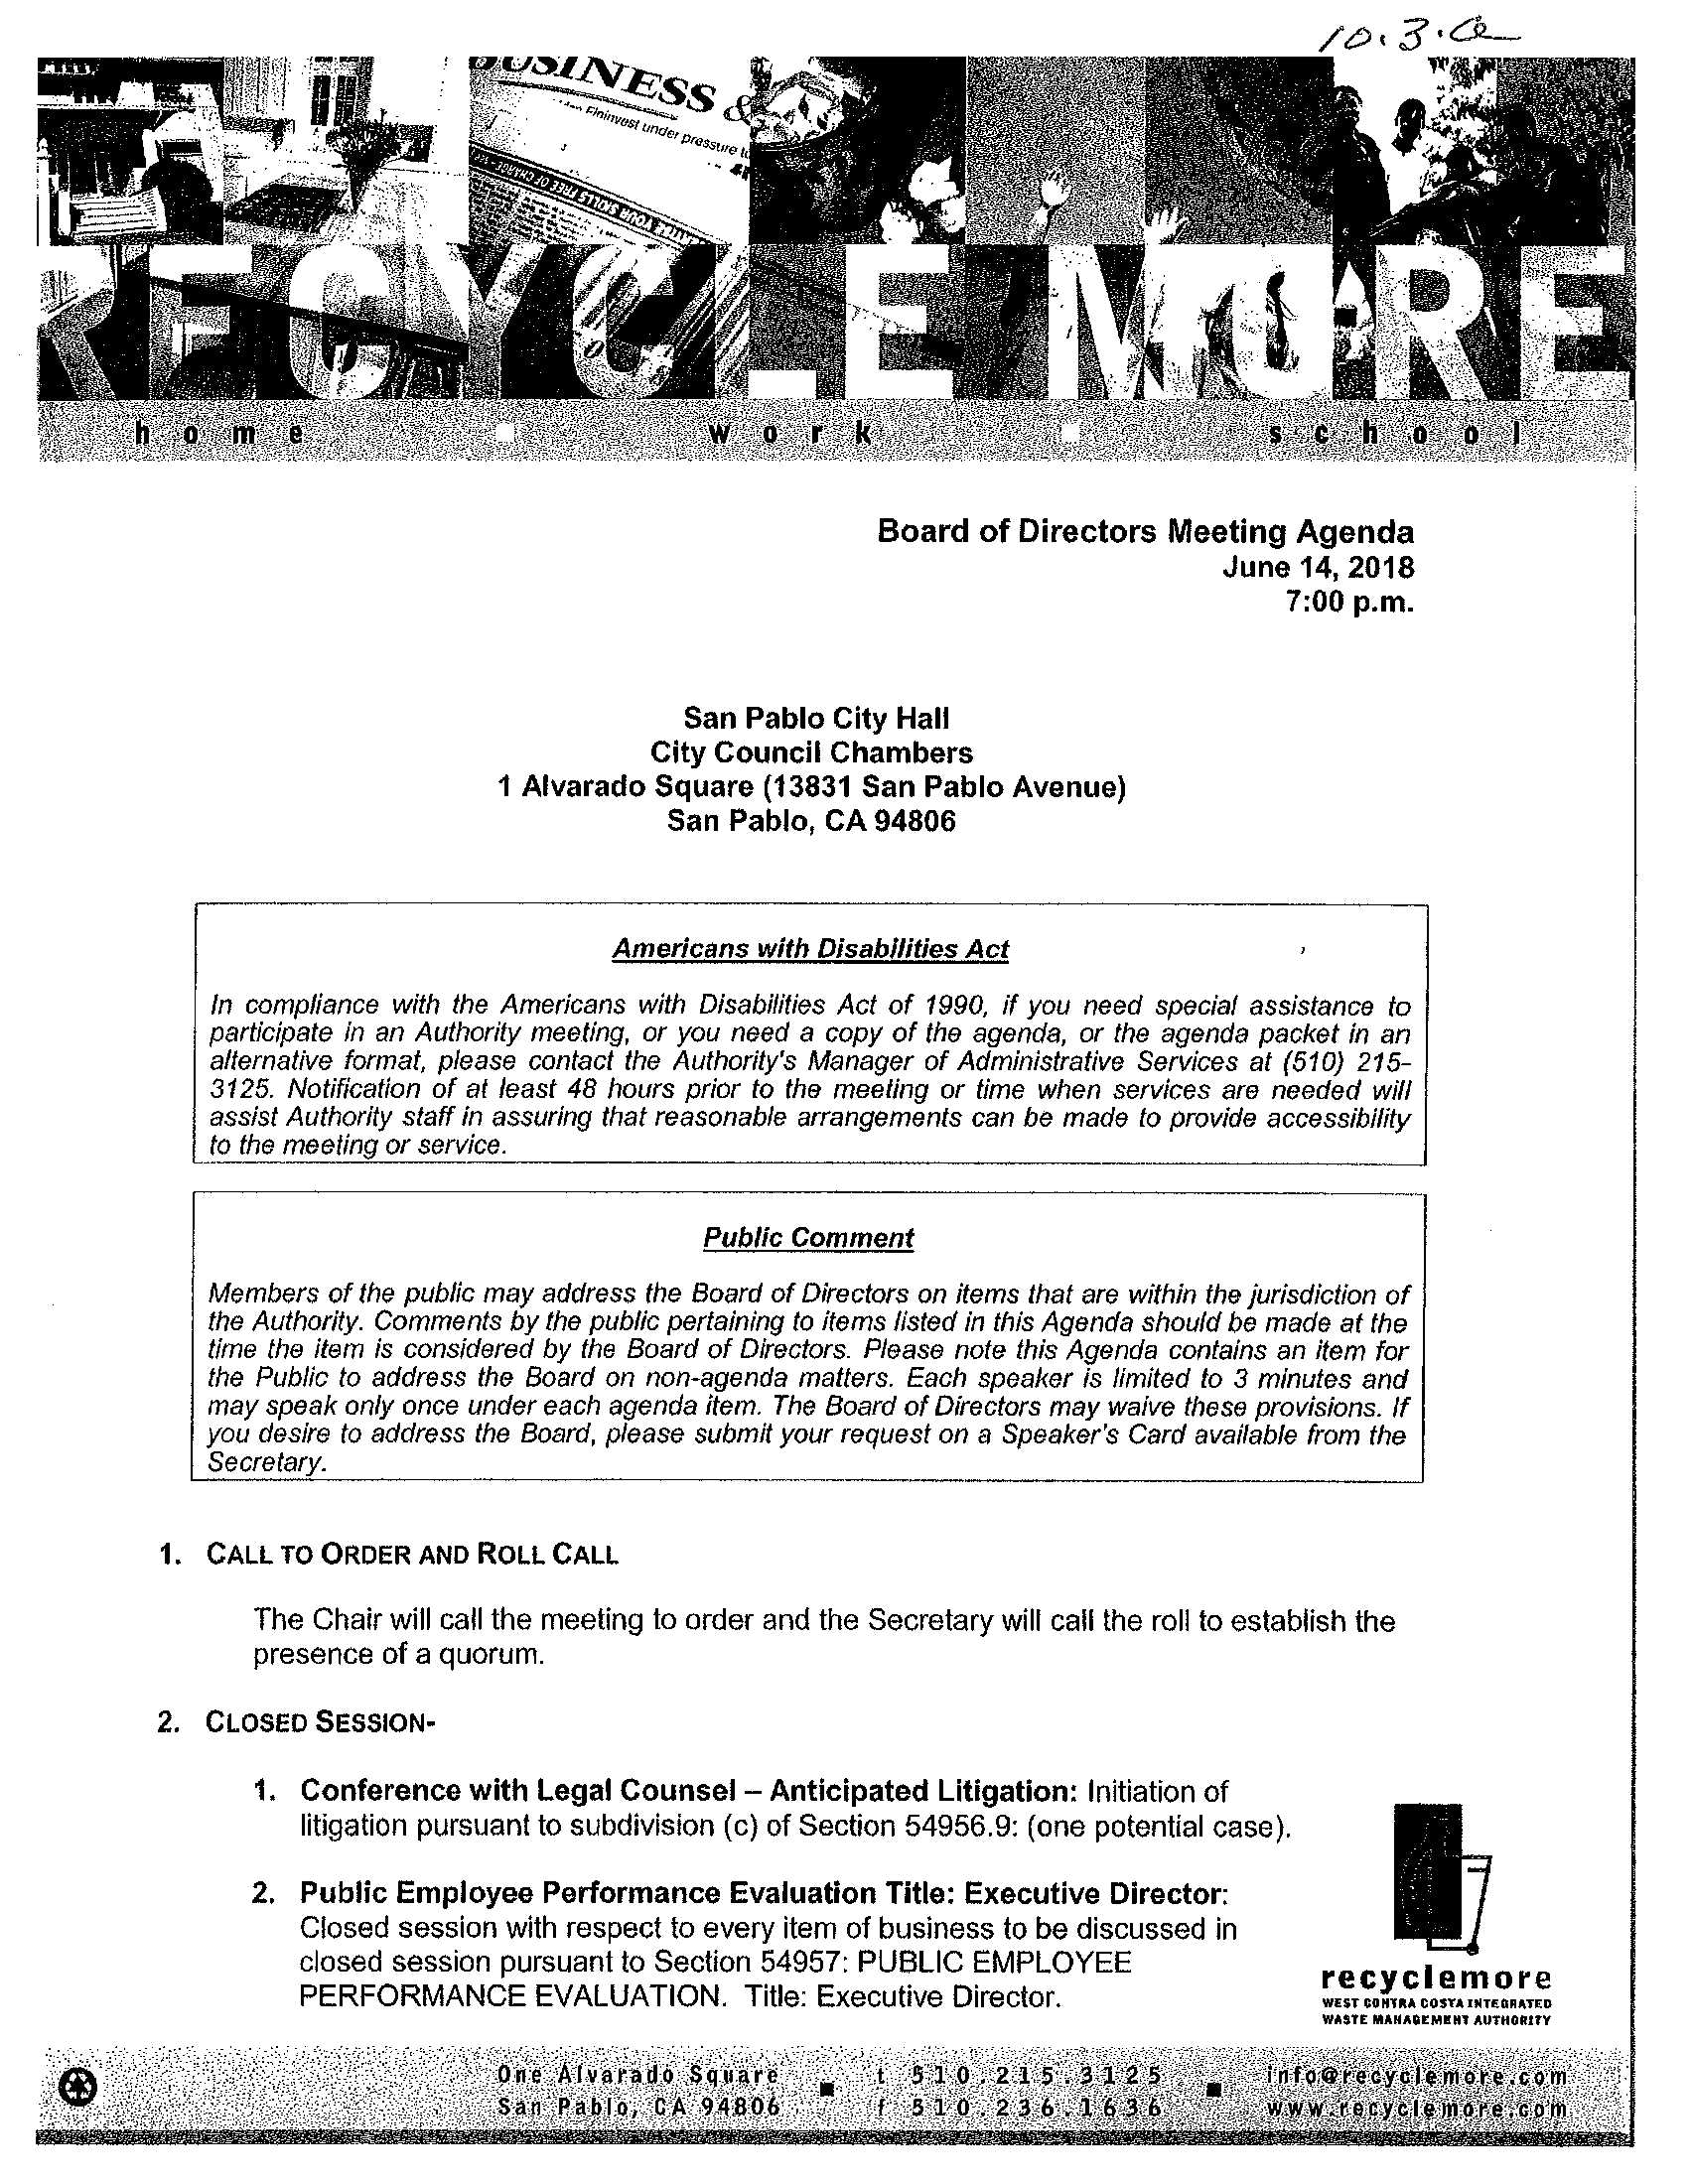 ESMAC Agenda 7.11.2018 (36 Pages)_18.jpg